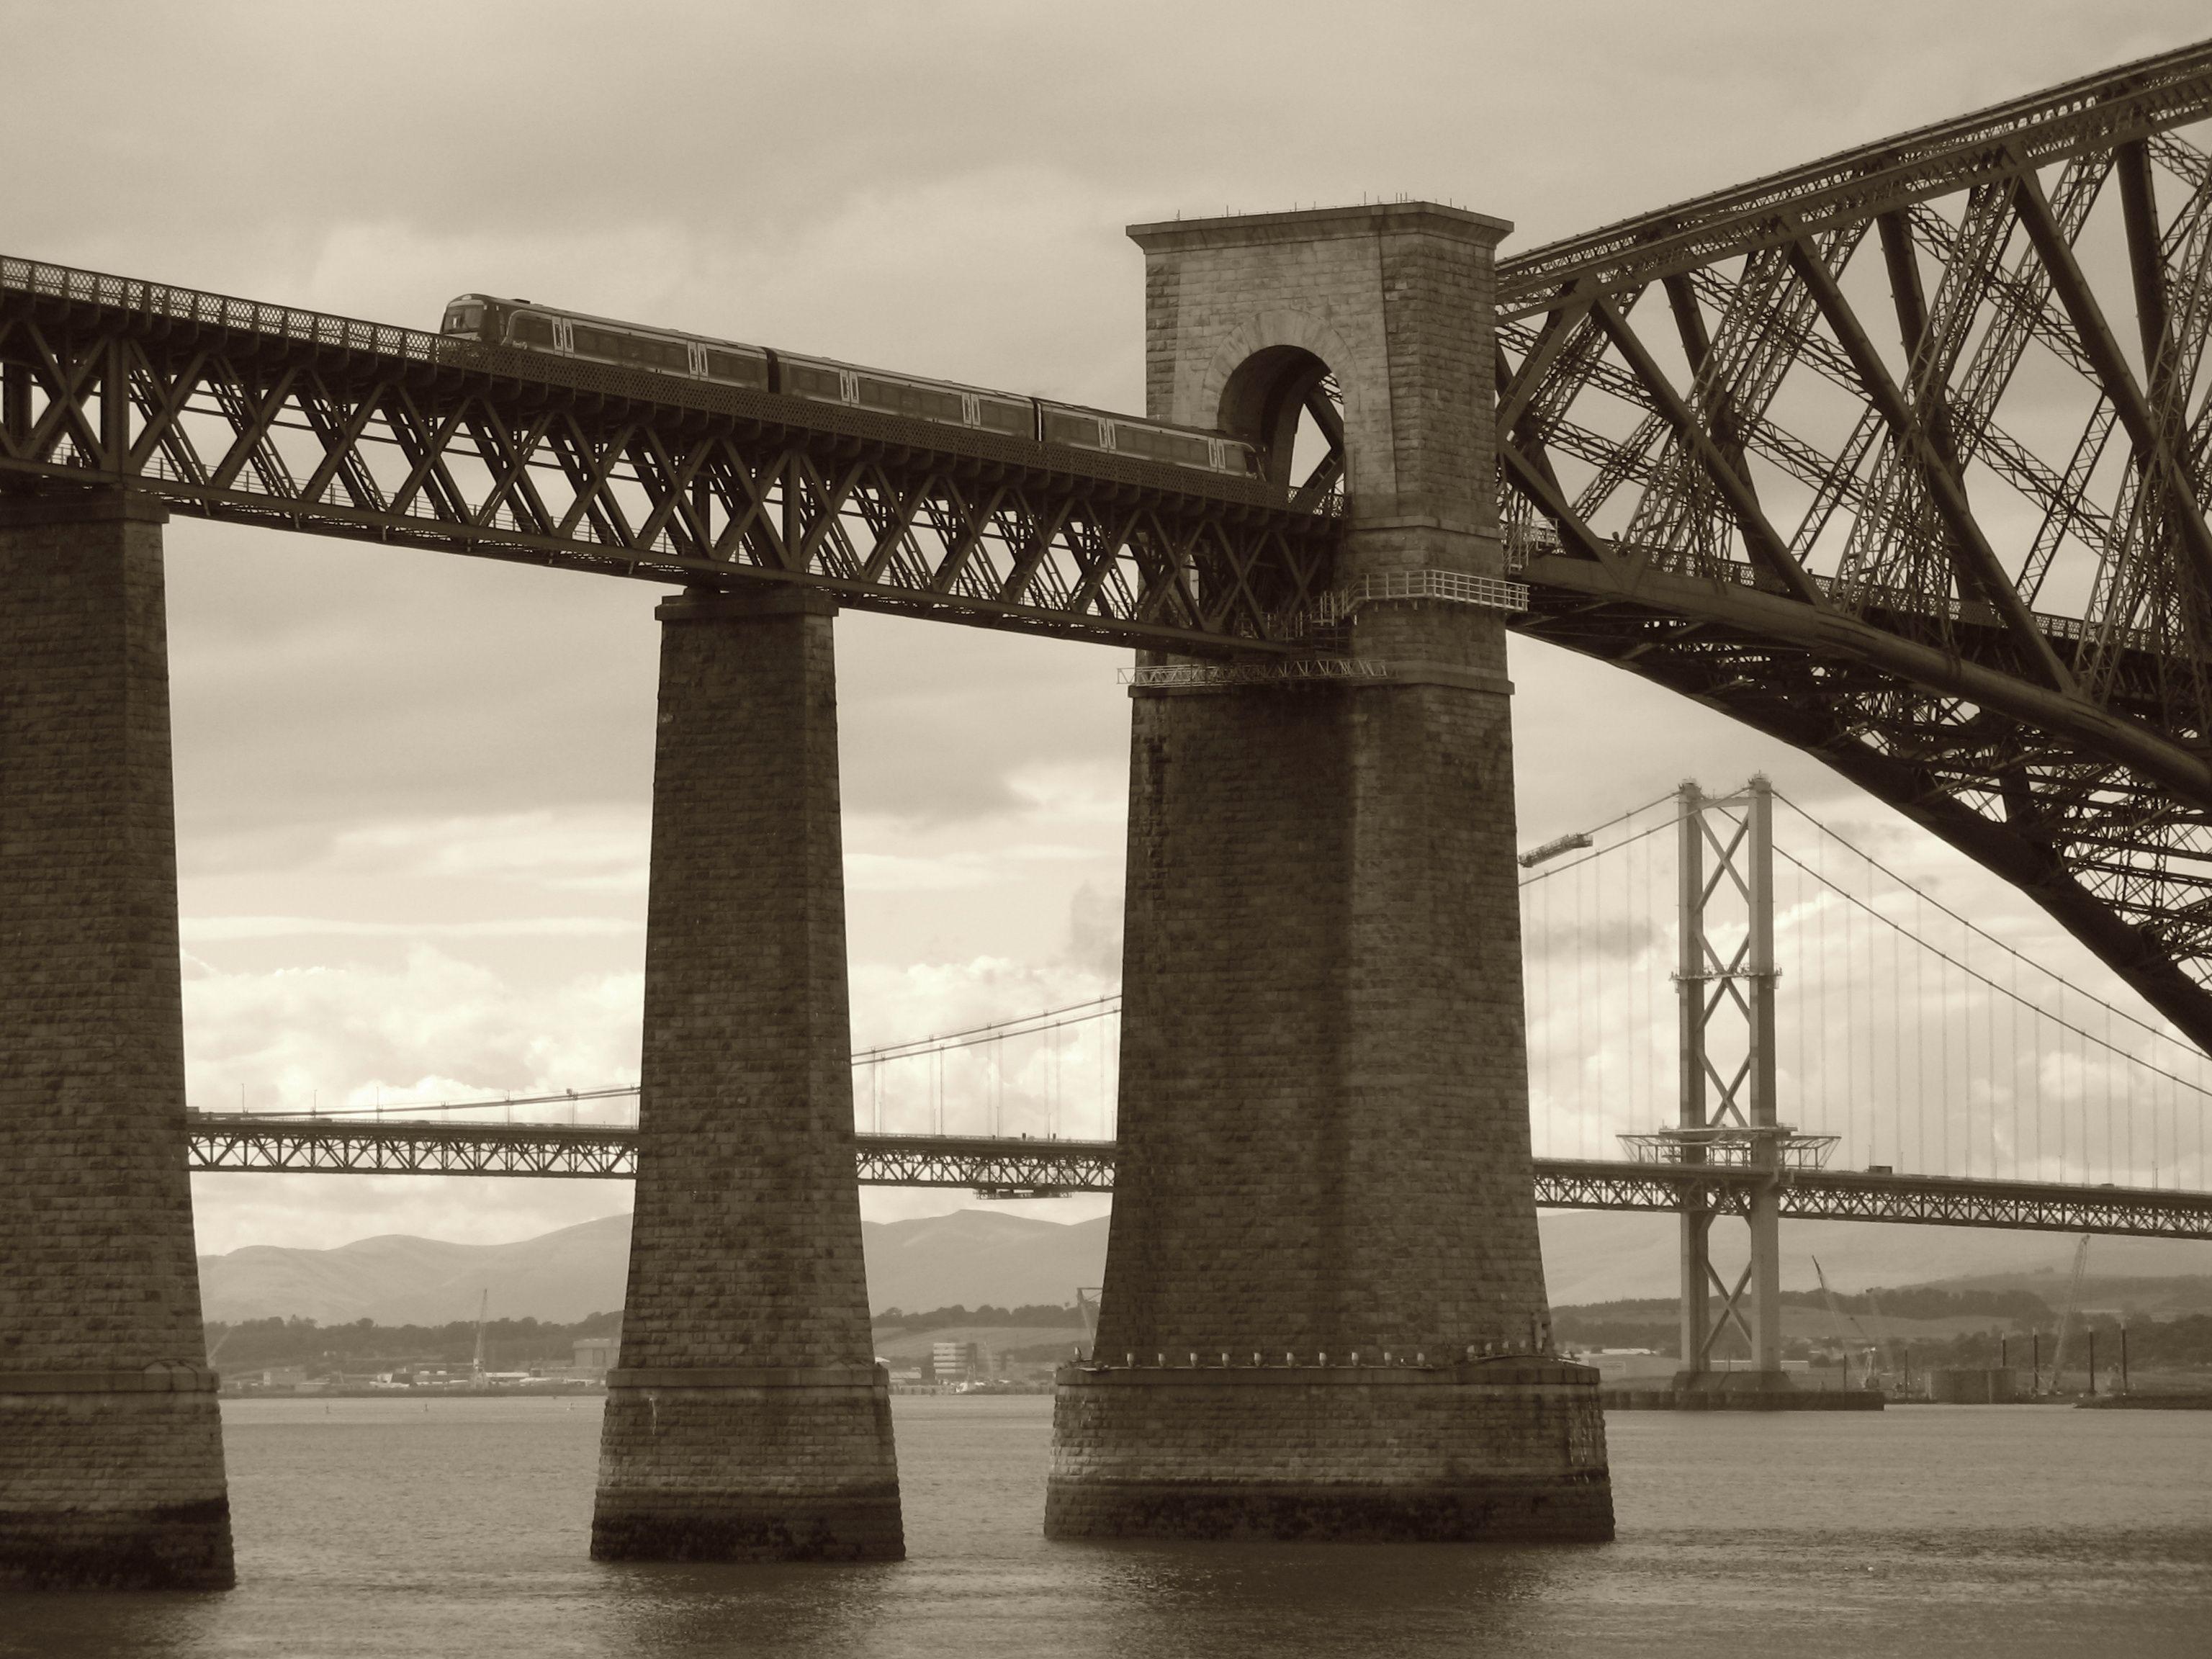 Forth bridges, Queensferry, Edinburgh